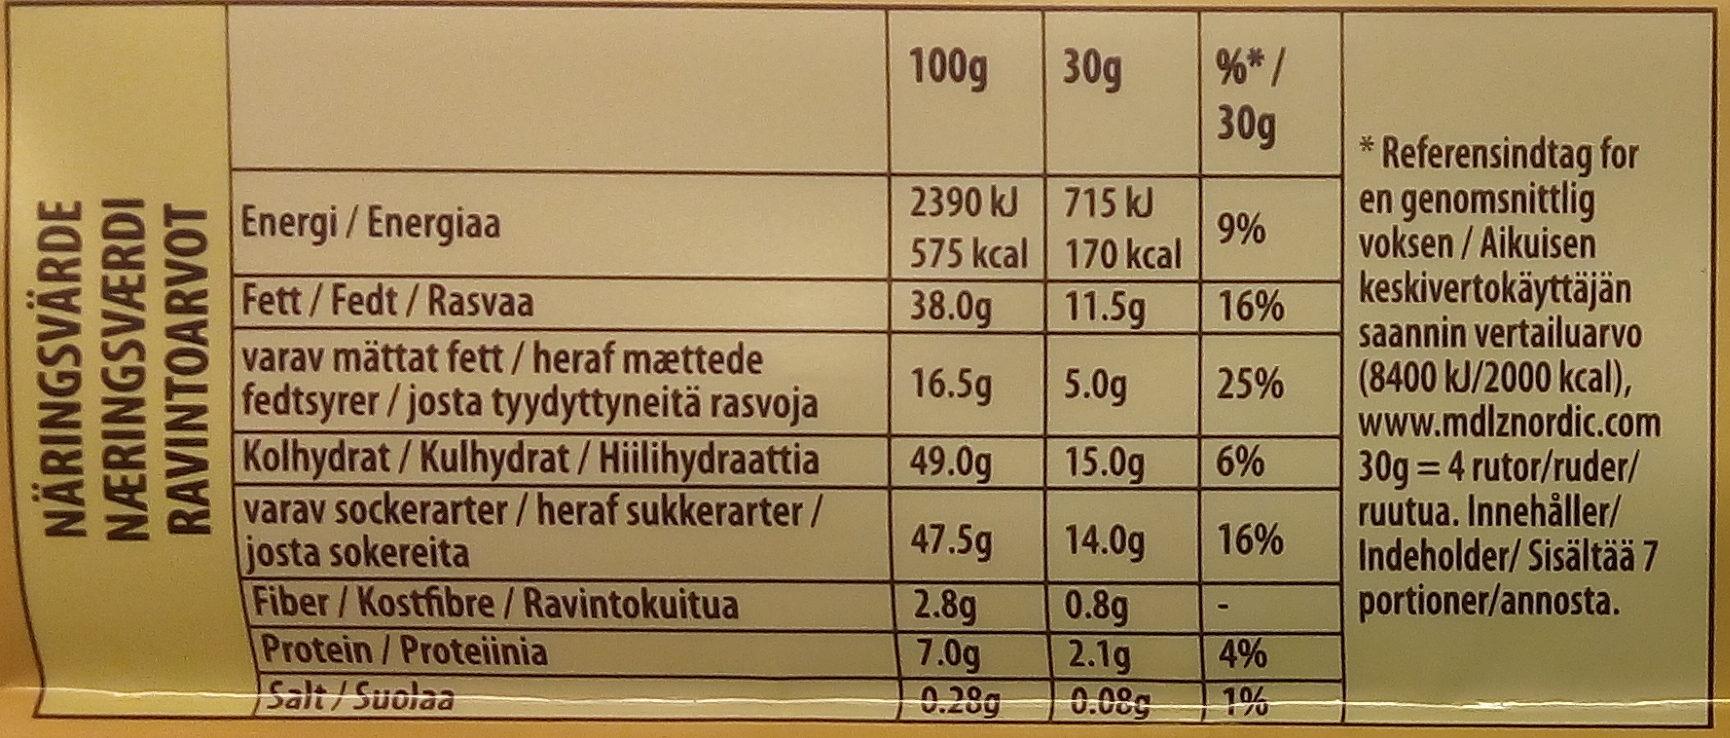 Marabou Helnôt 200g - Informations nutritionnelles - sv